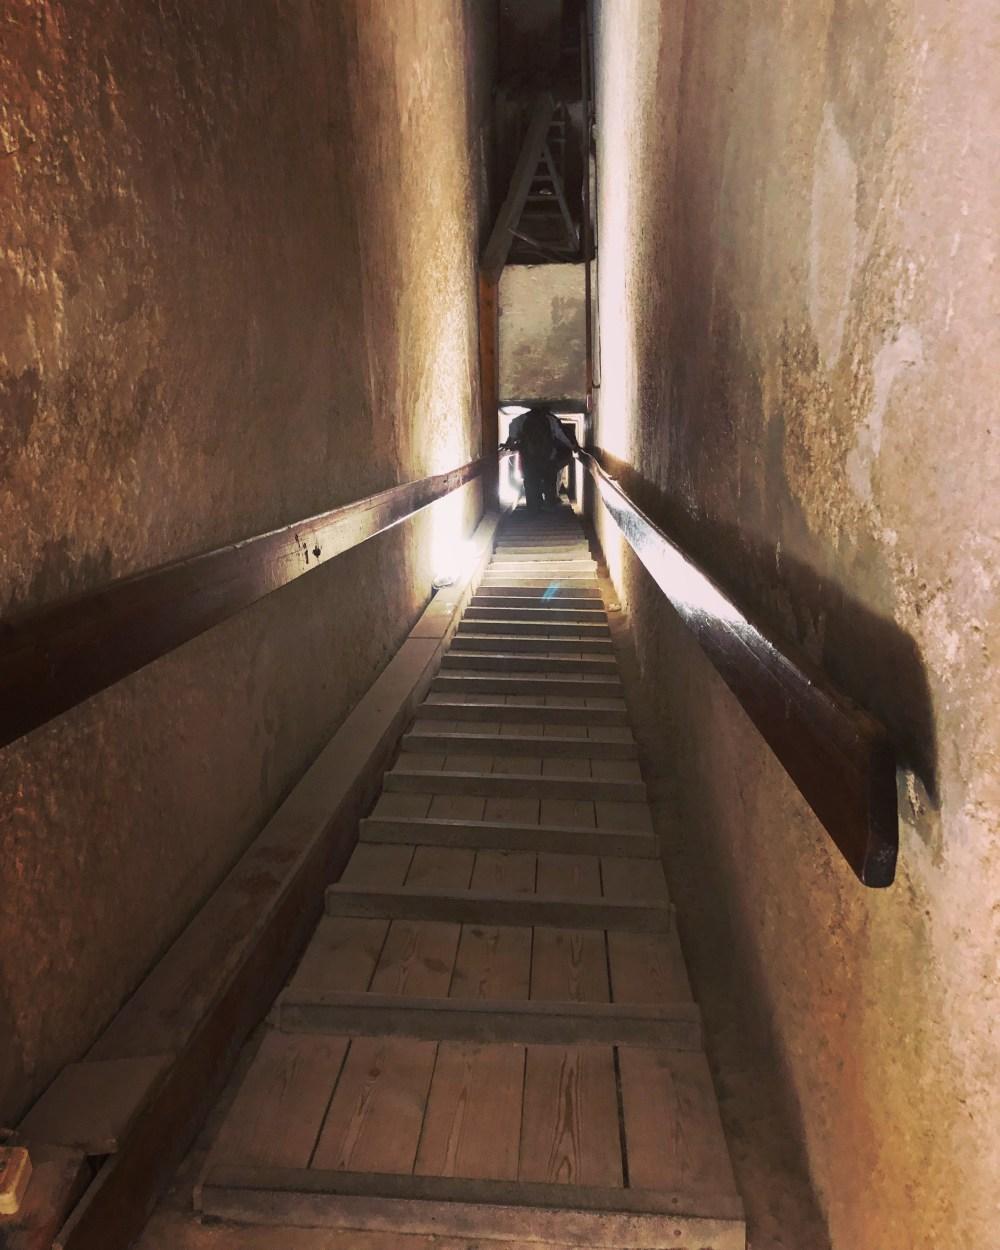 Day 2 Great Pyramid of Giza 7